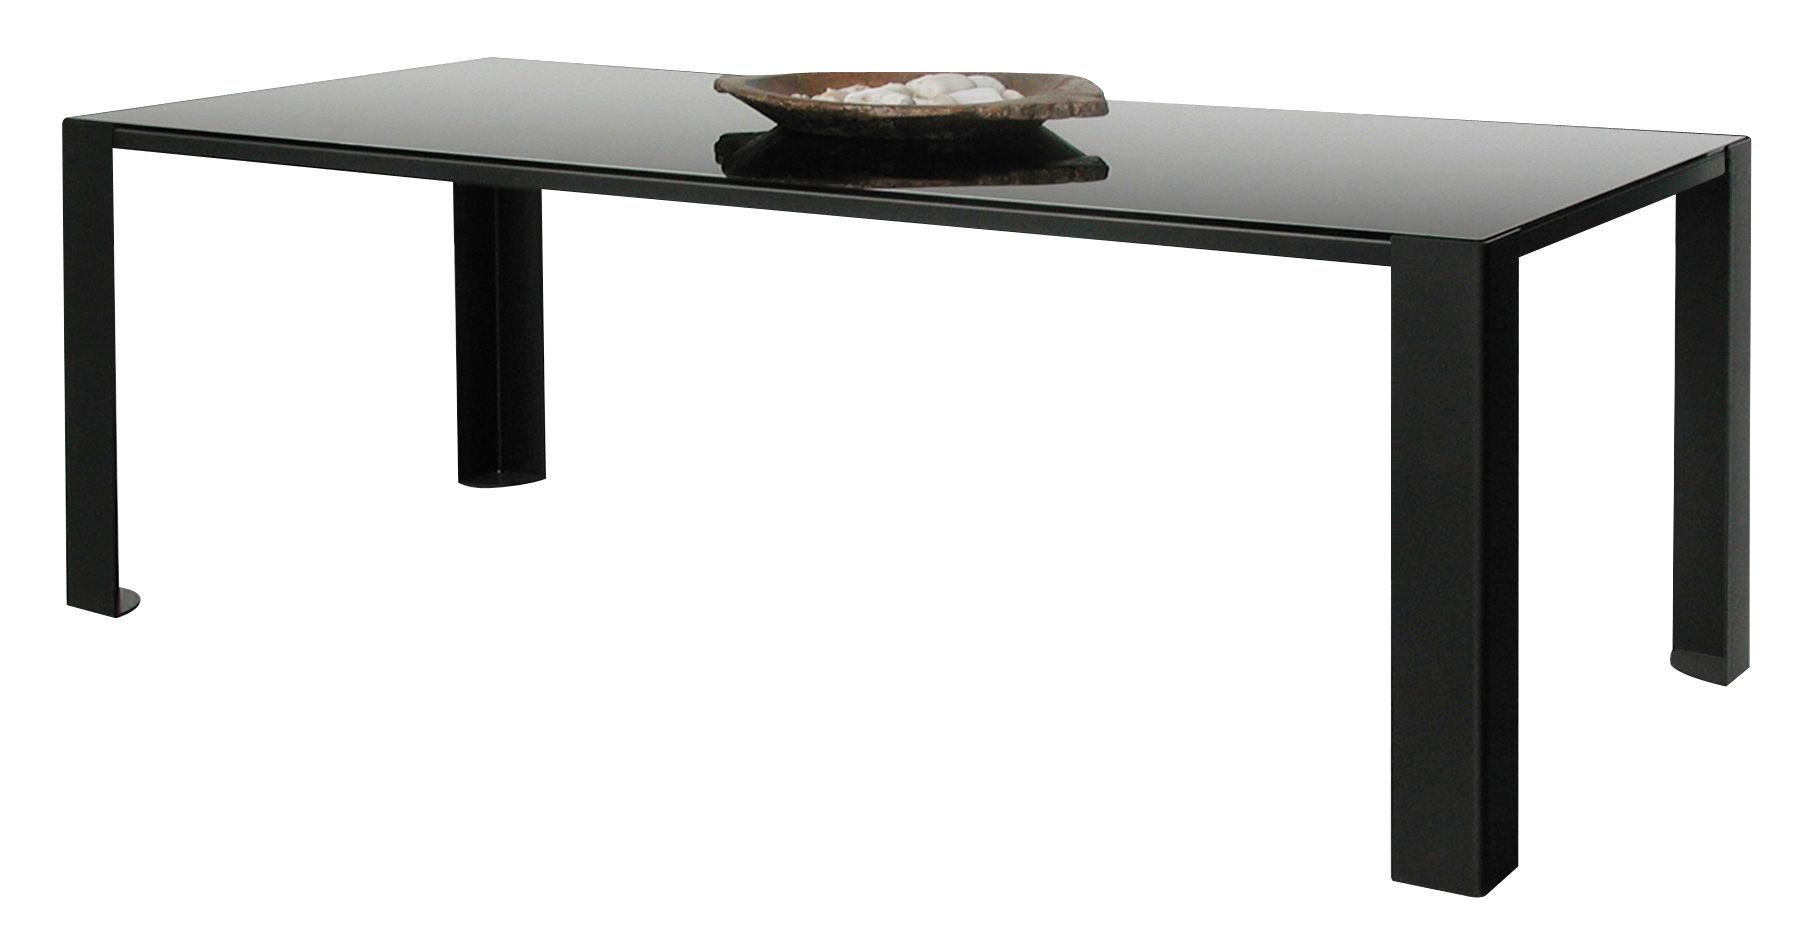 big irony black glass table  black glass table top  l  cm  -  black glass table top  l zoom